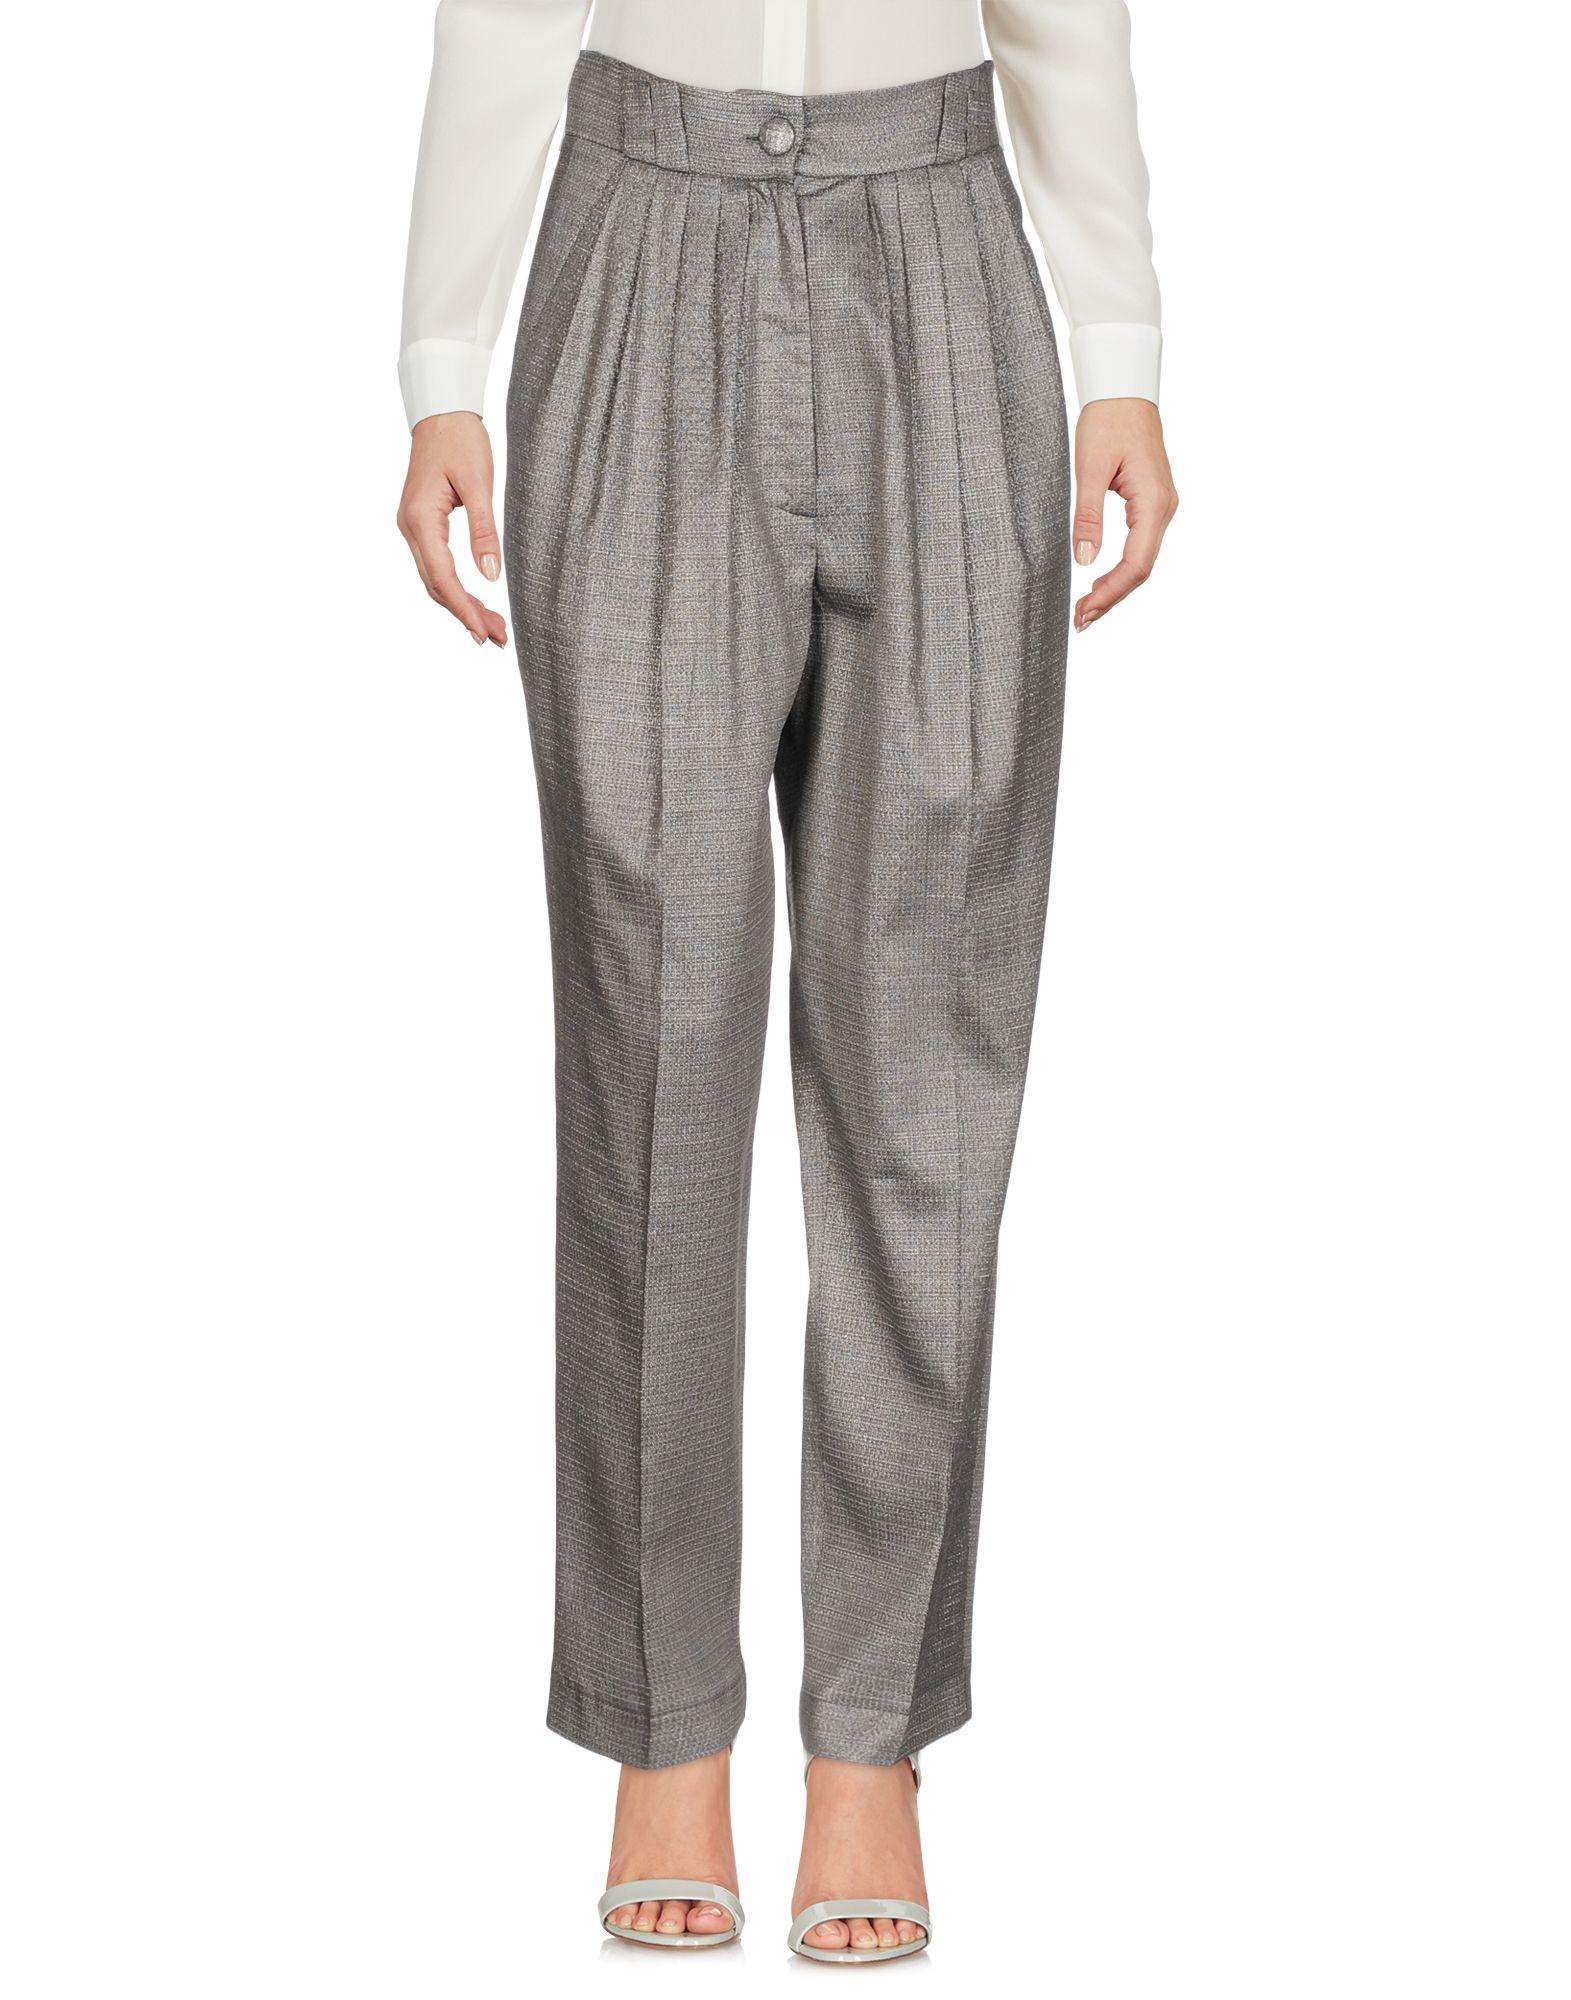 DANIELE CARLOTTA Casual Pants in Grey